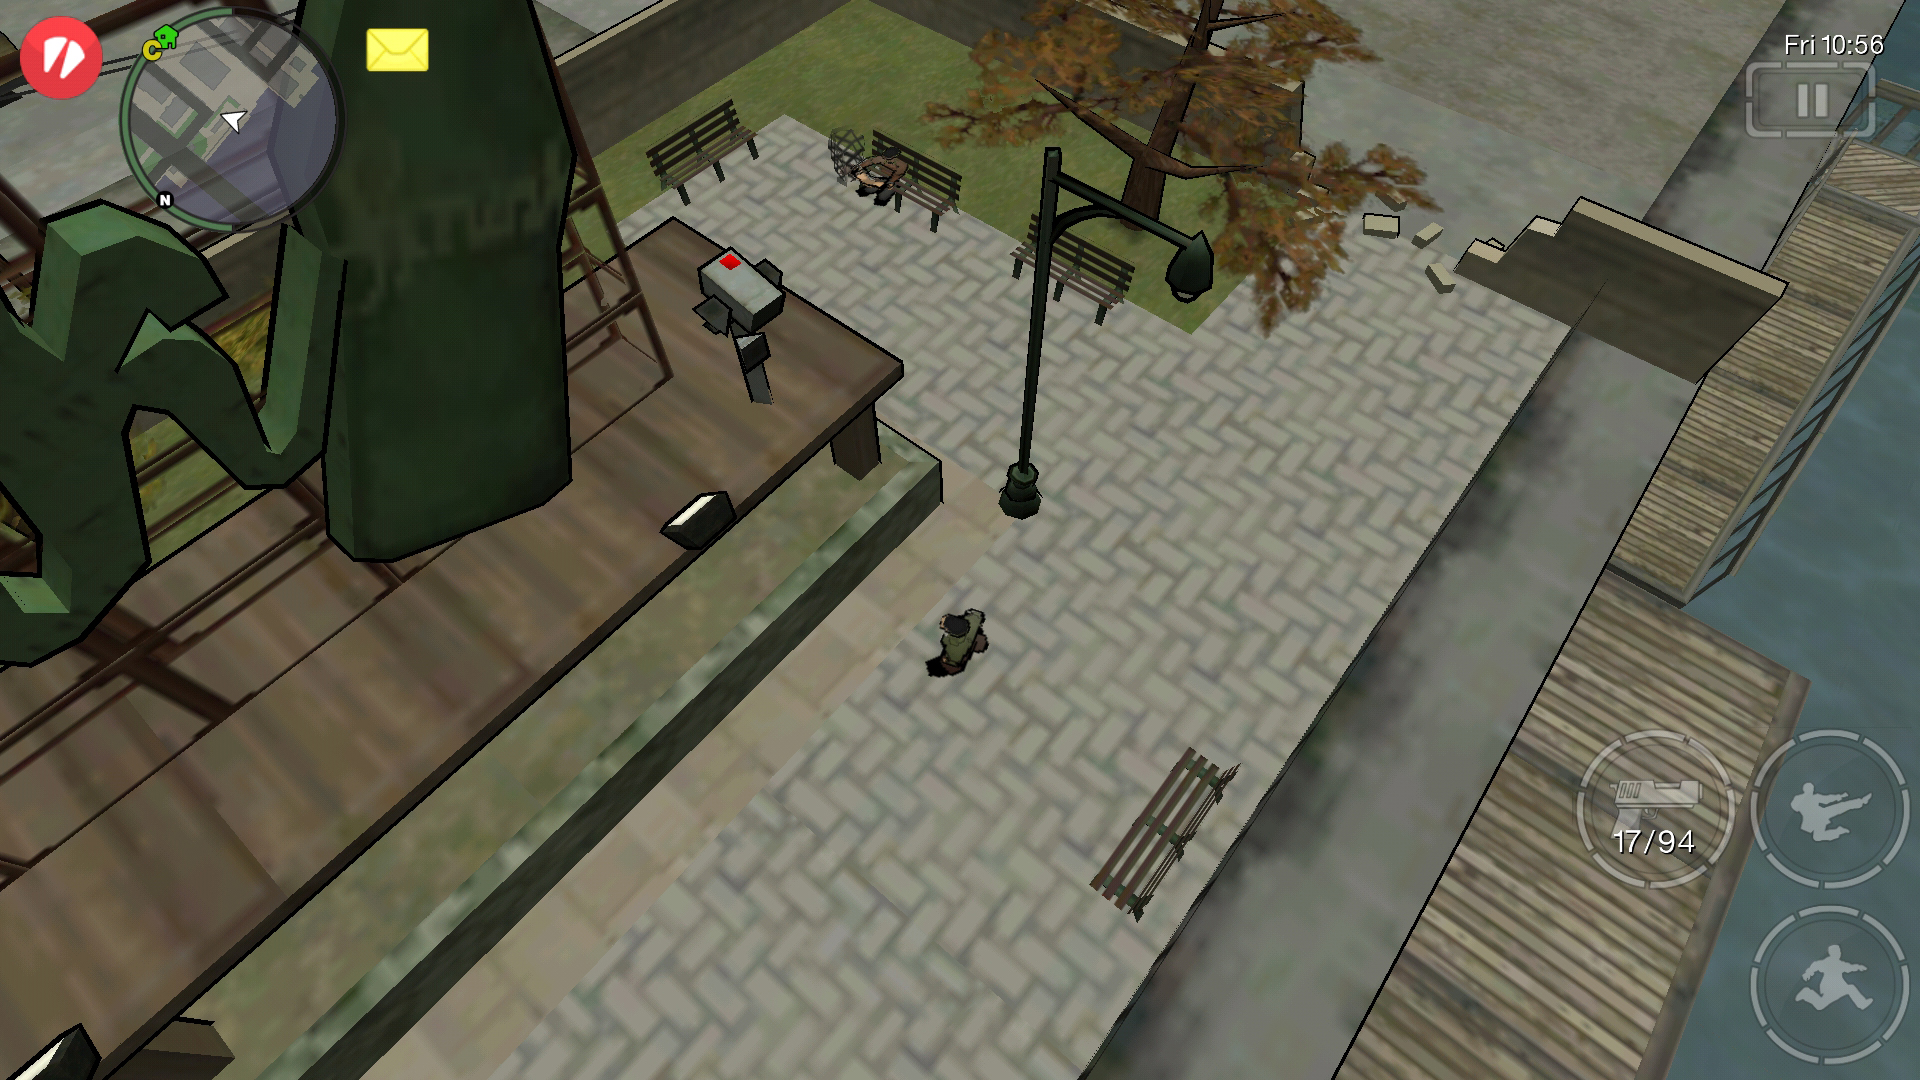 File:Security Cameras on GTA Chinatown Wars.jpg